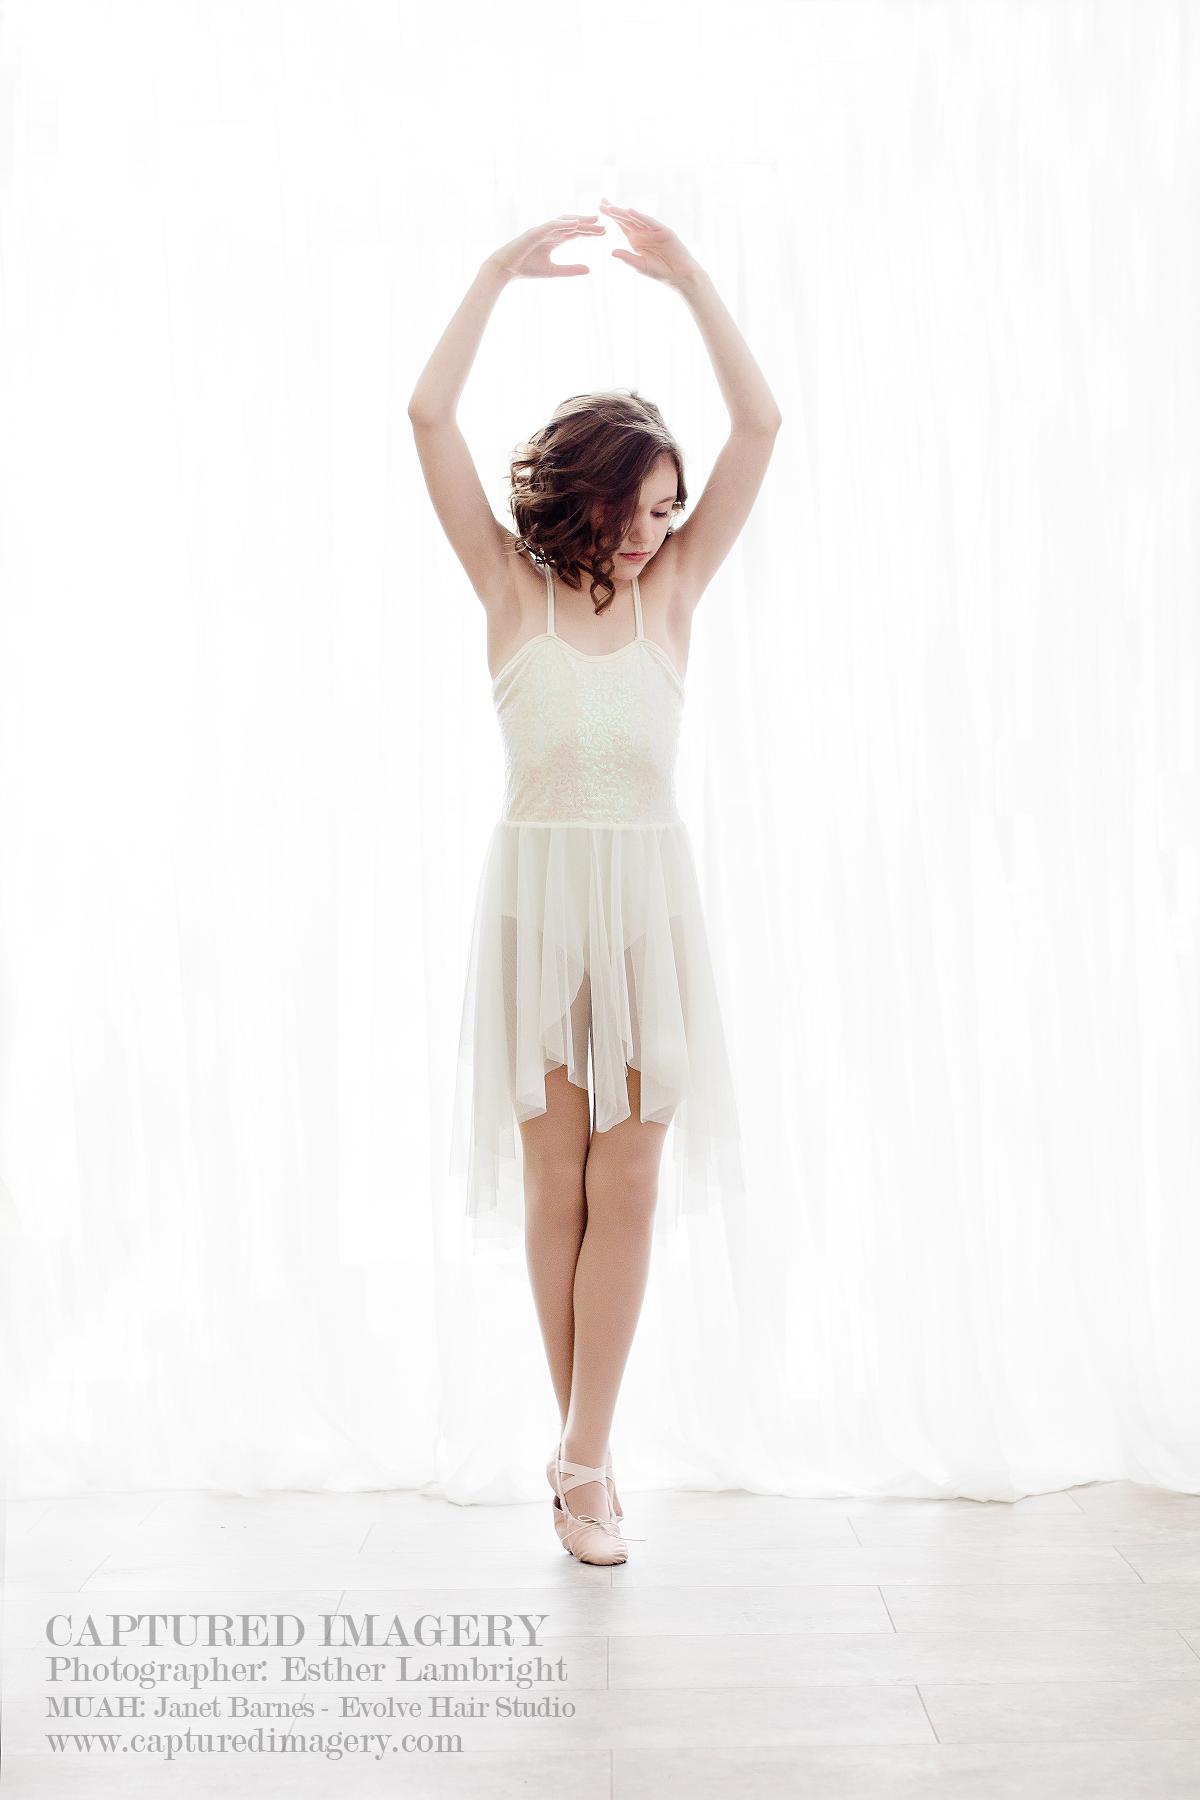 studio-dance-ballet-portrait-photographer